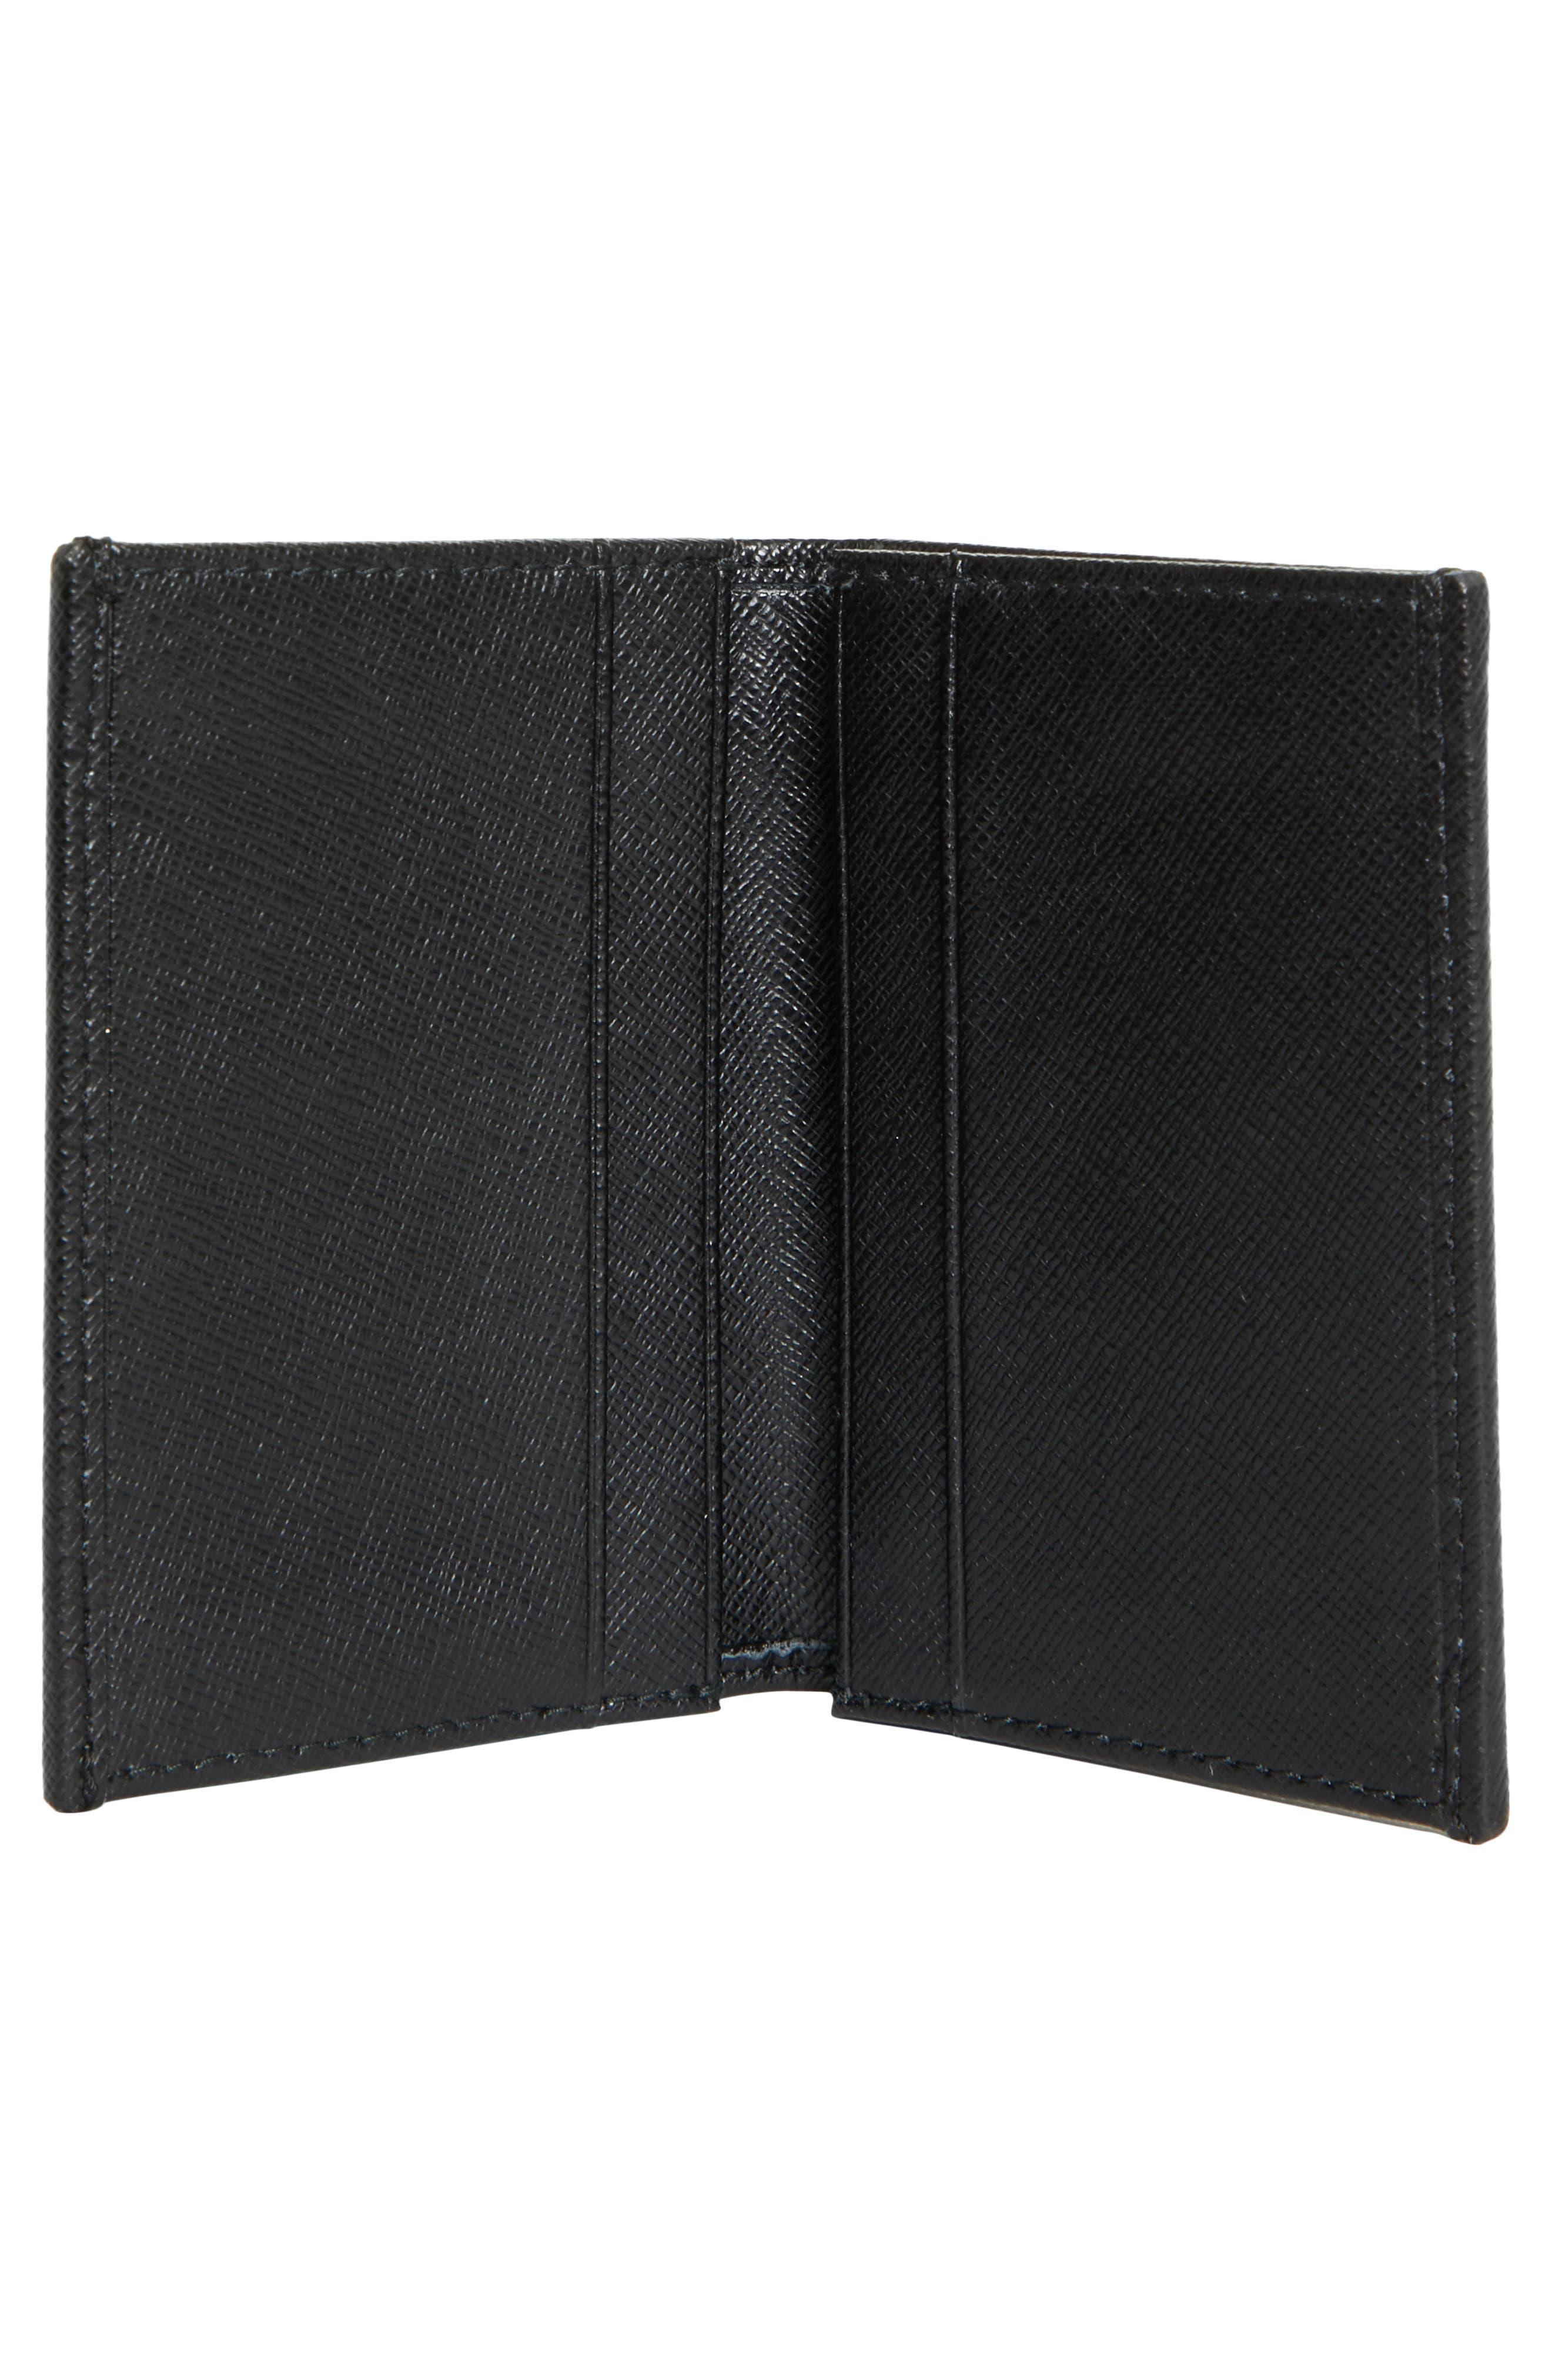 Small Flap Wallet,                             Alternate thumbnail 2, color,                             Black